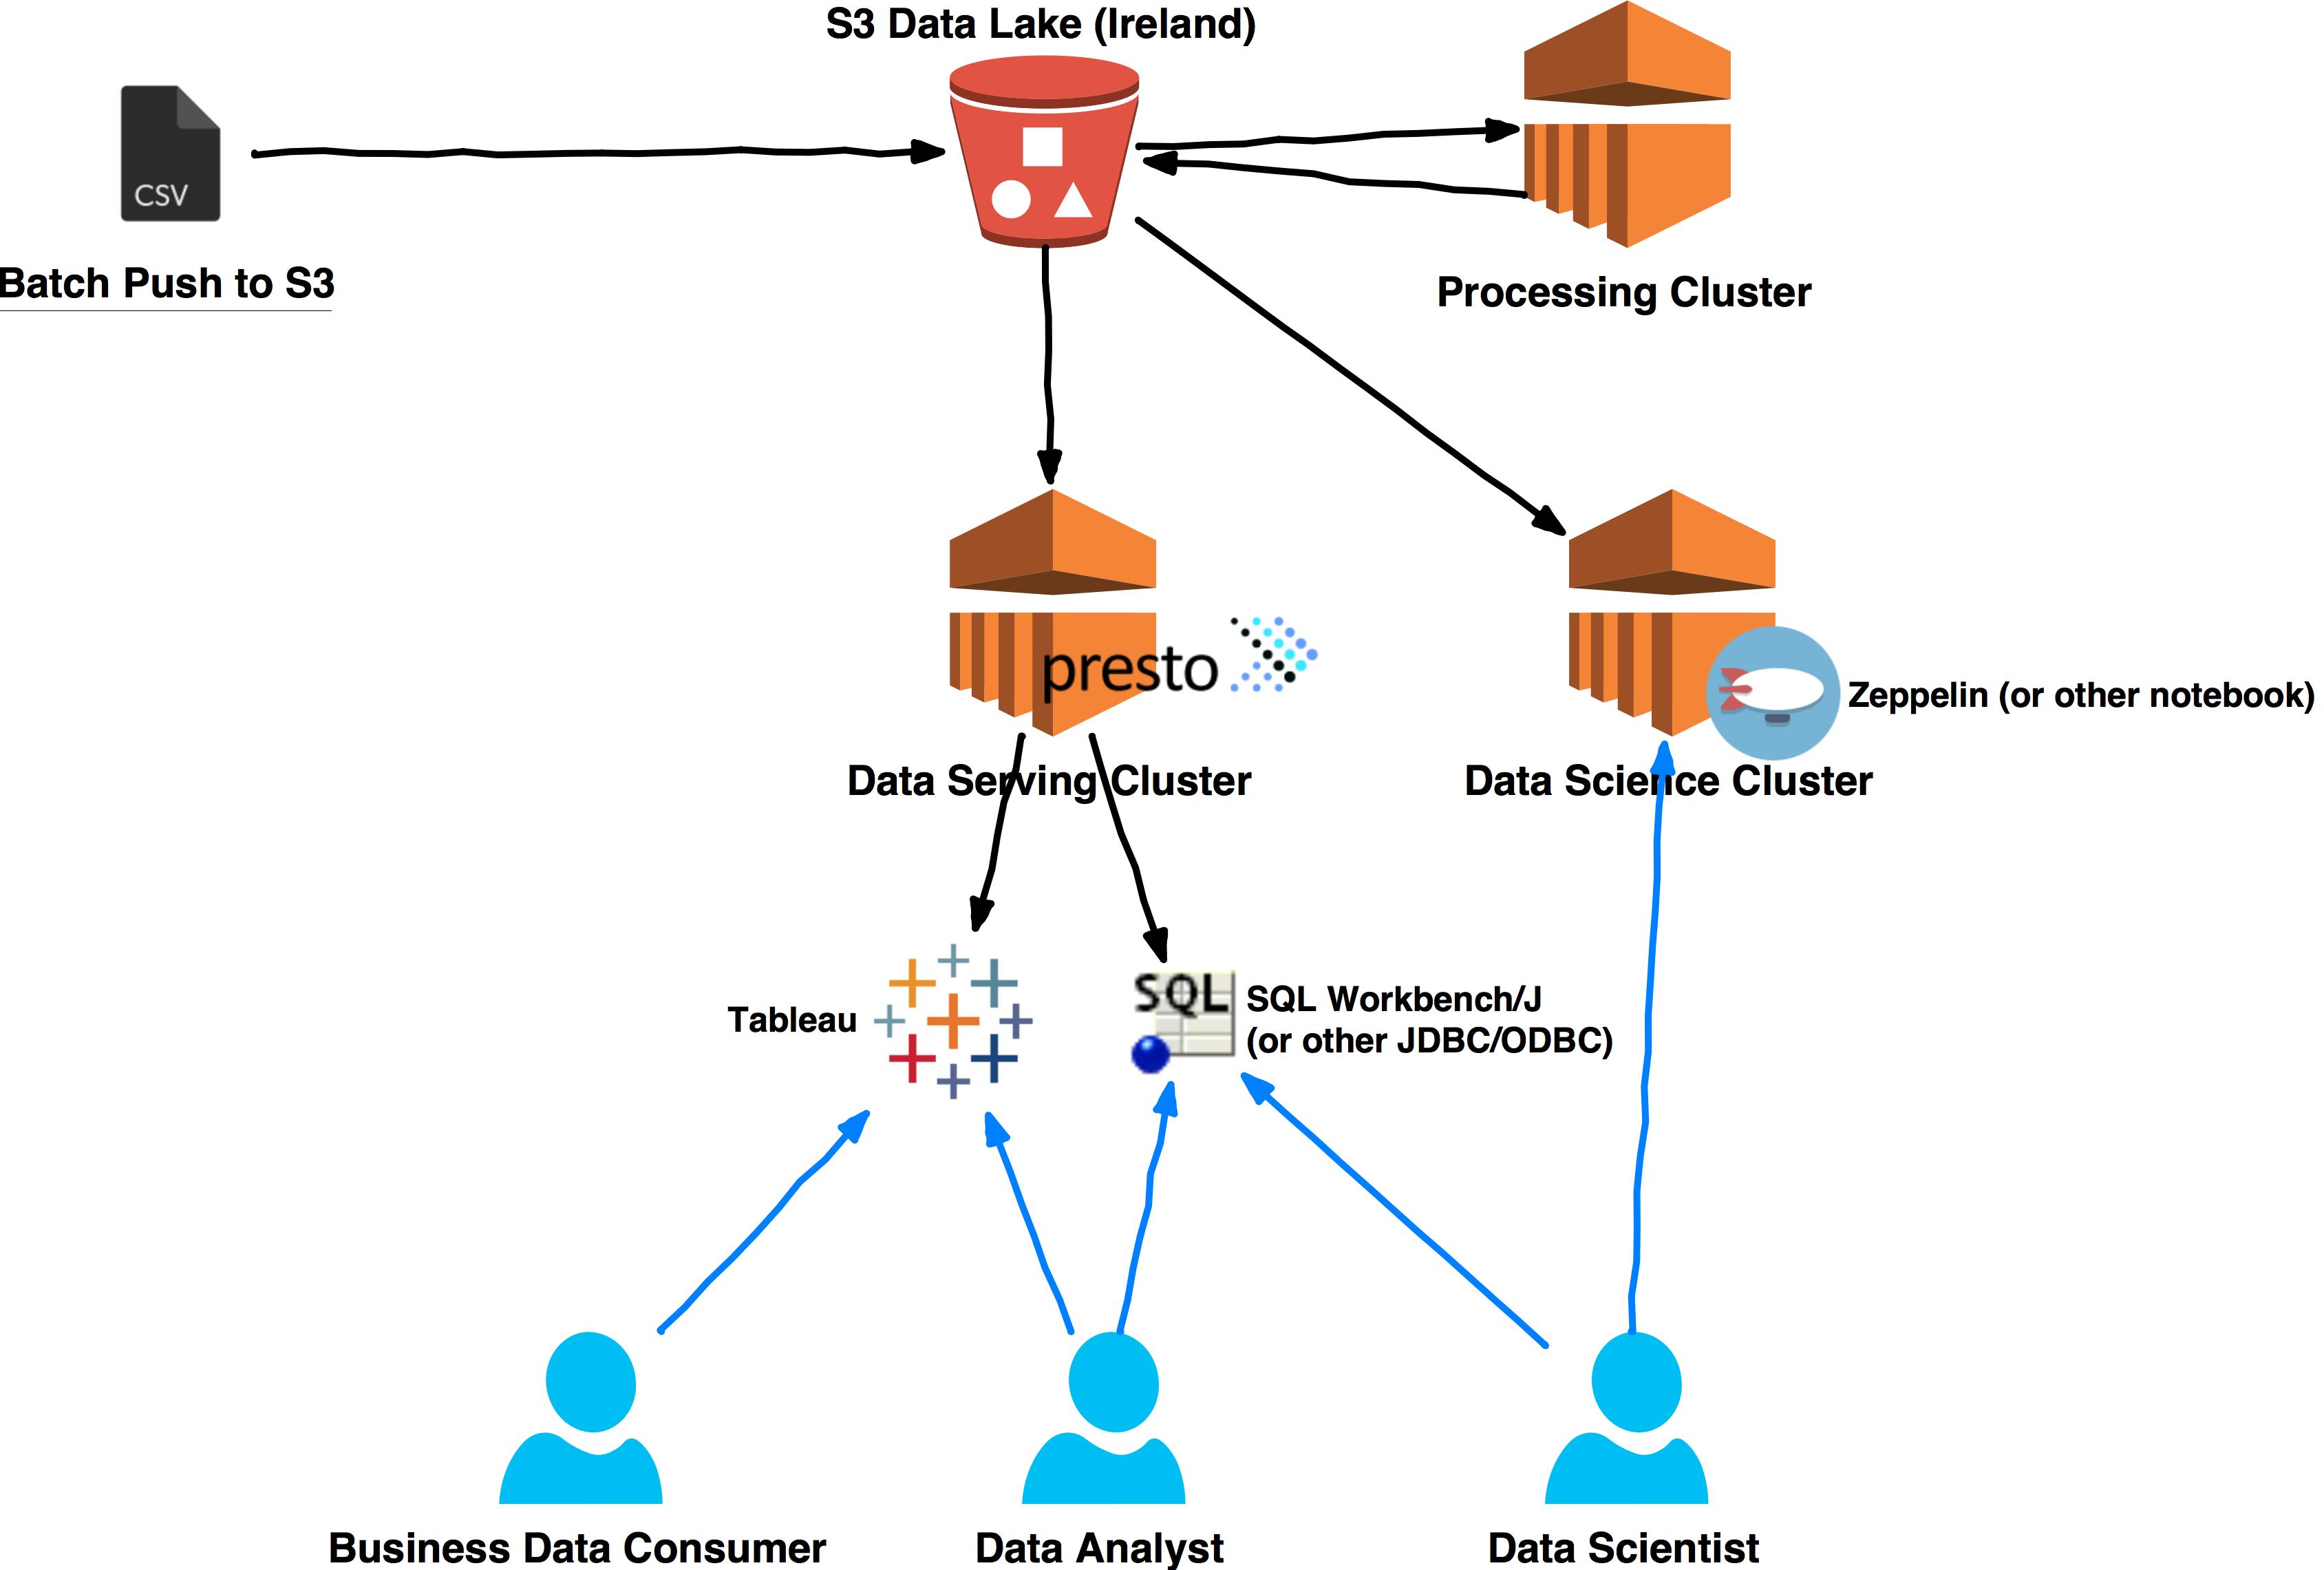 Building A Data Pipeline Using Apache Spark  Part 1 - Sam Elamin